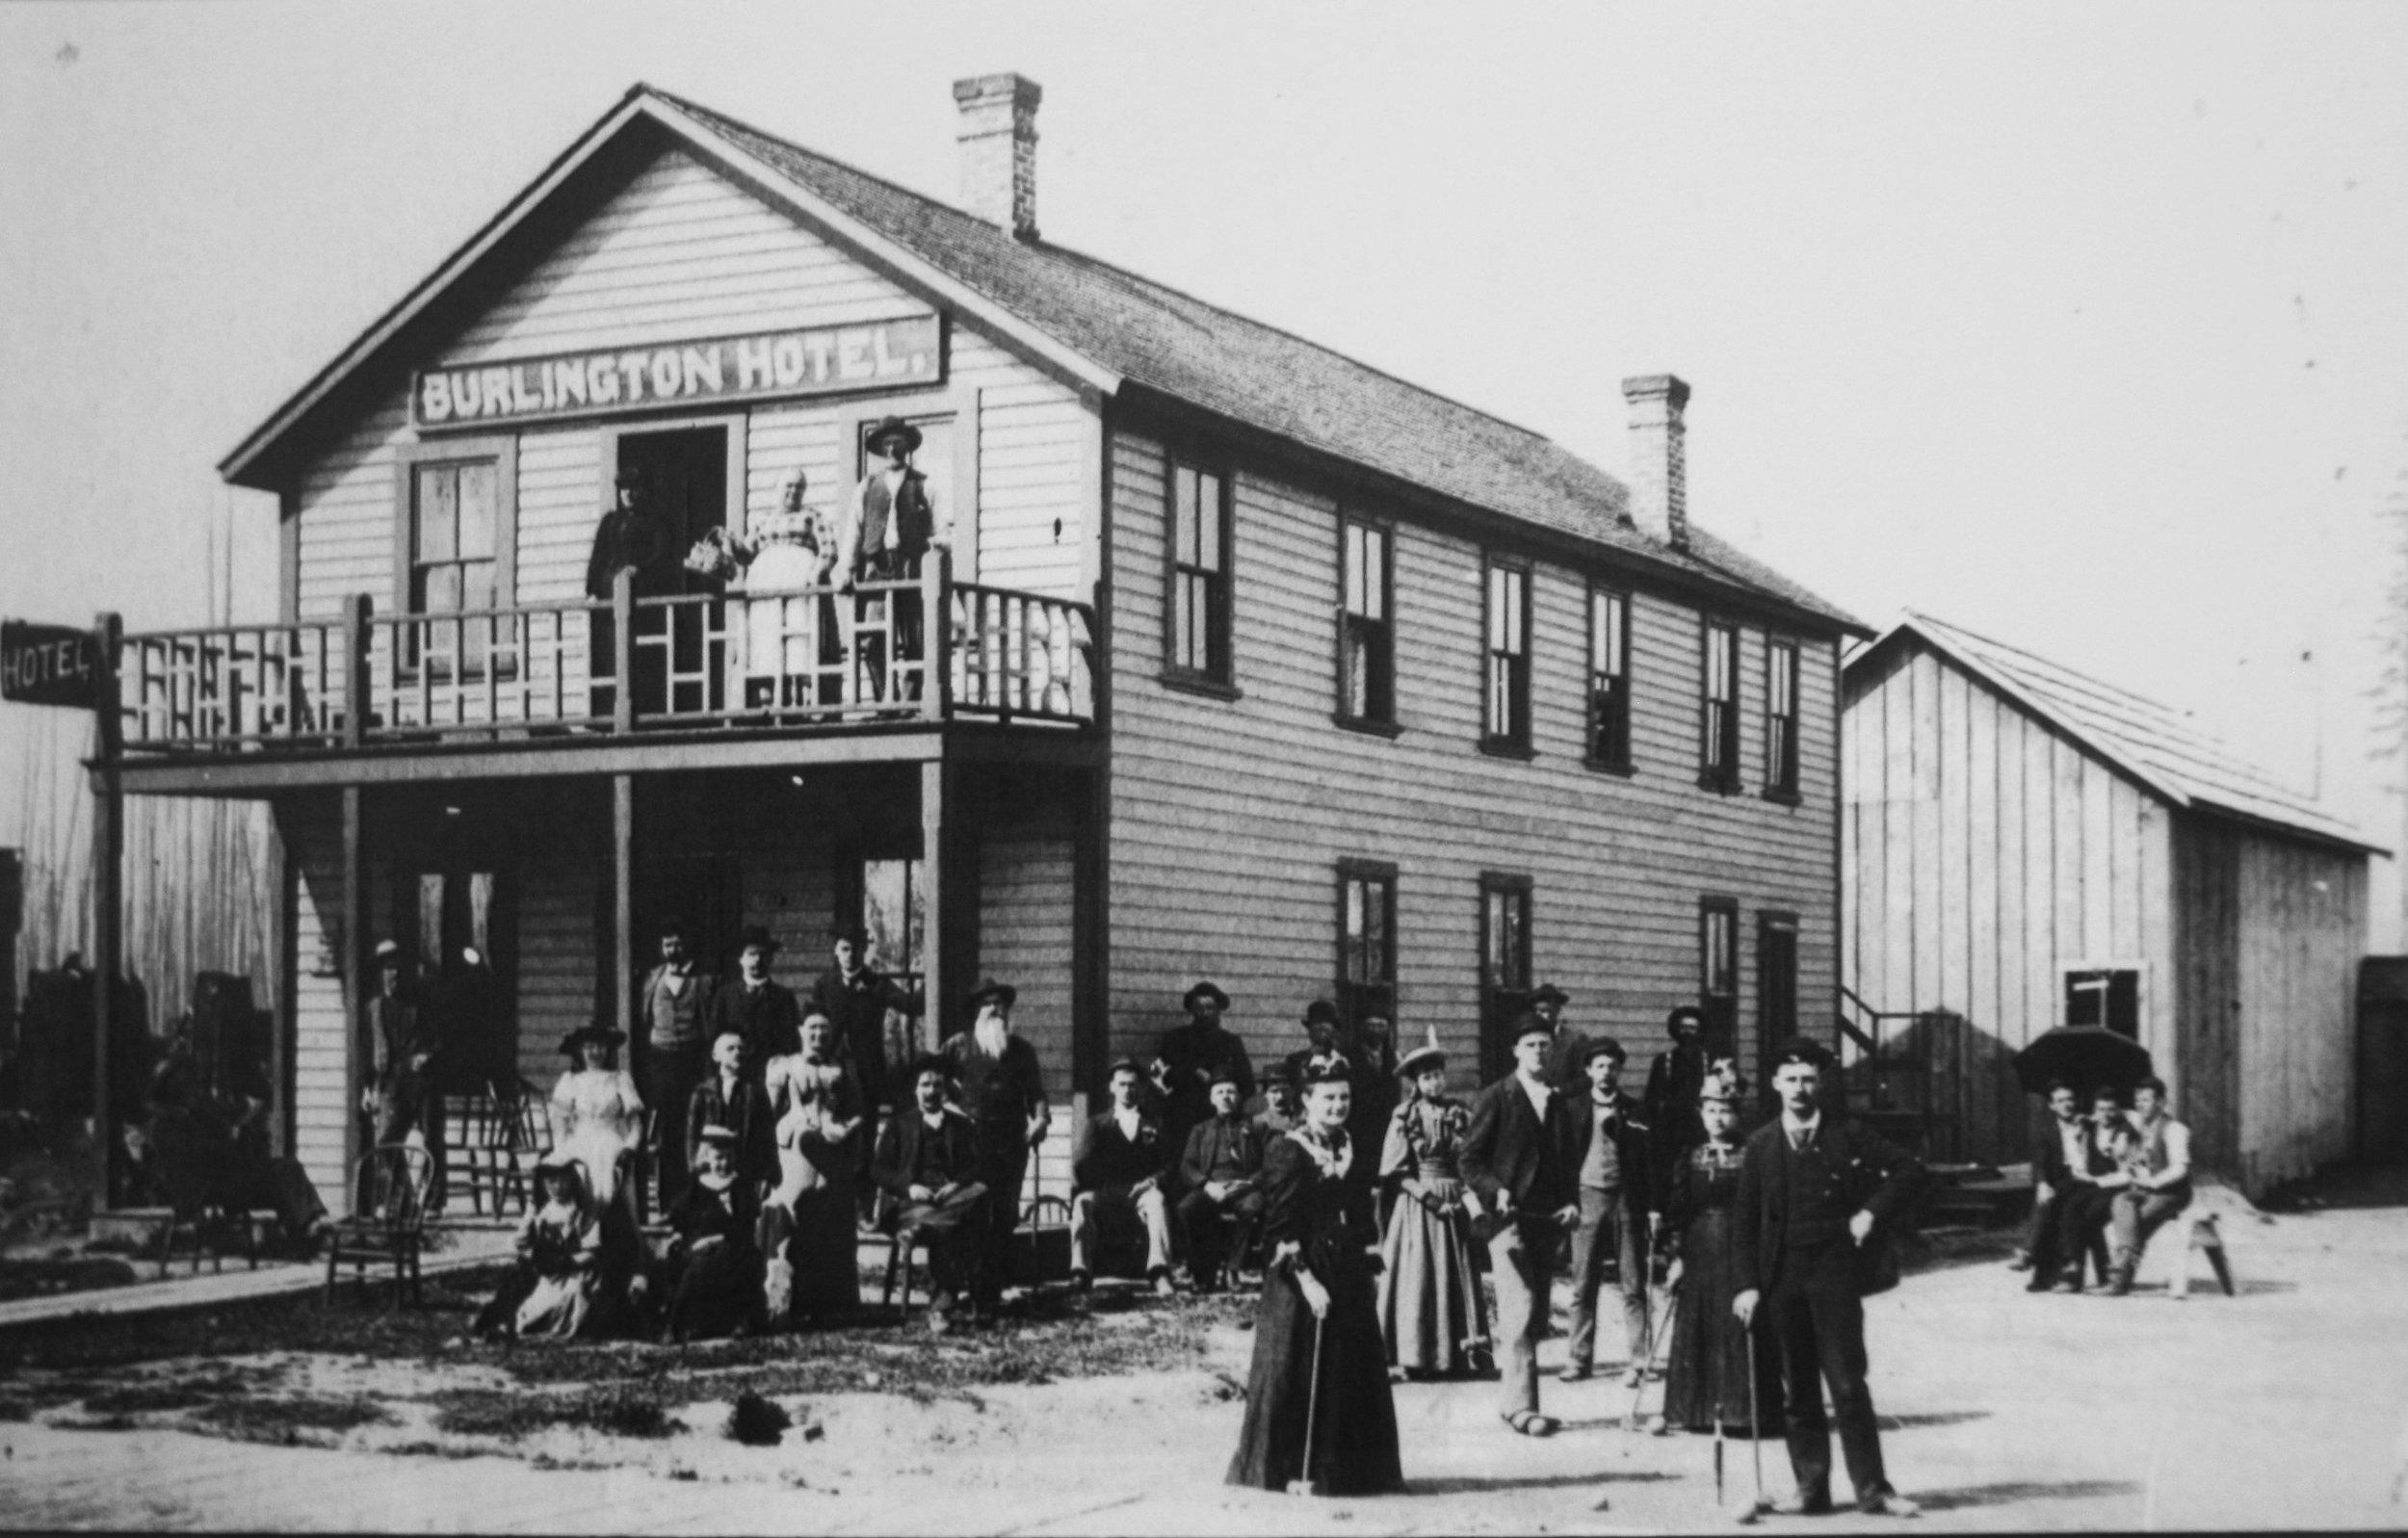 BurlingtonHotel-1892.jpg